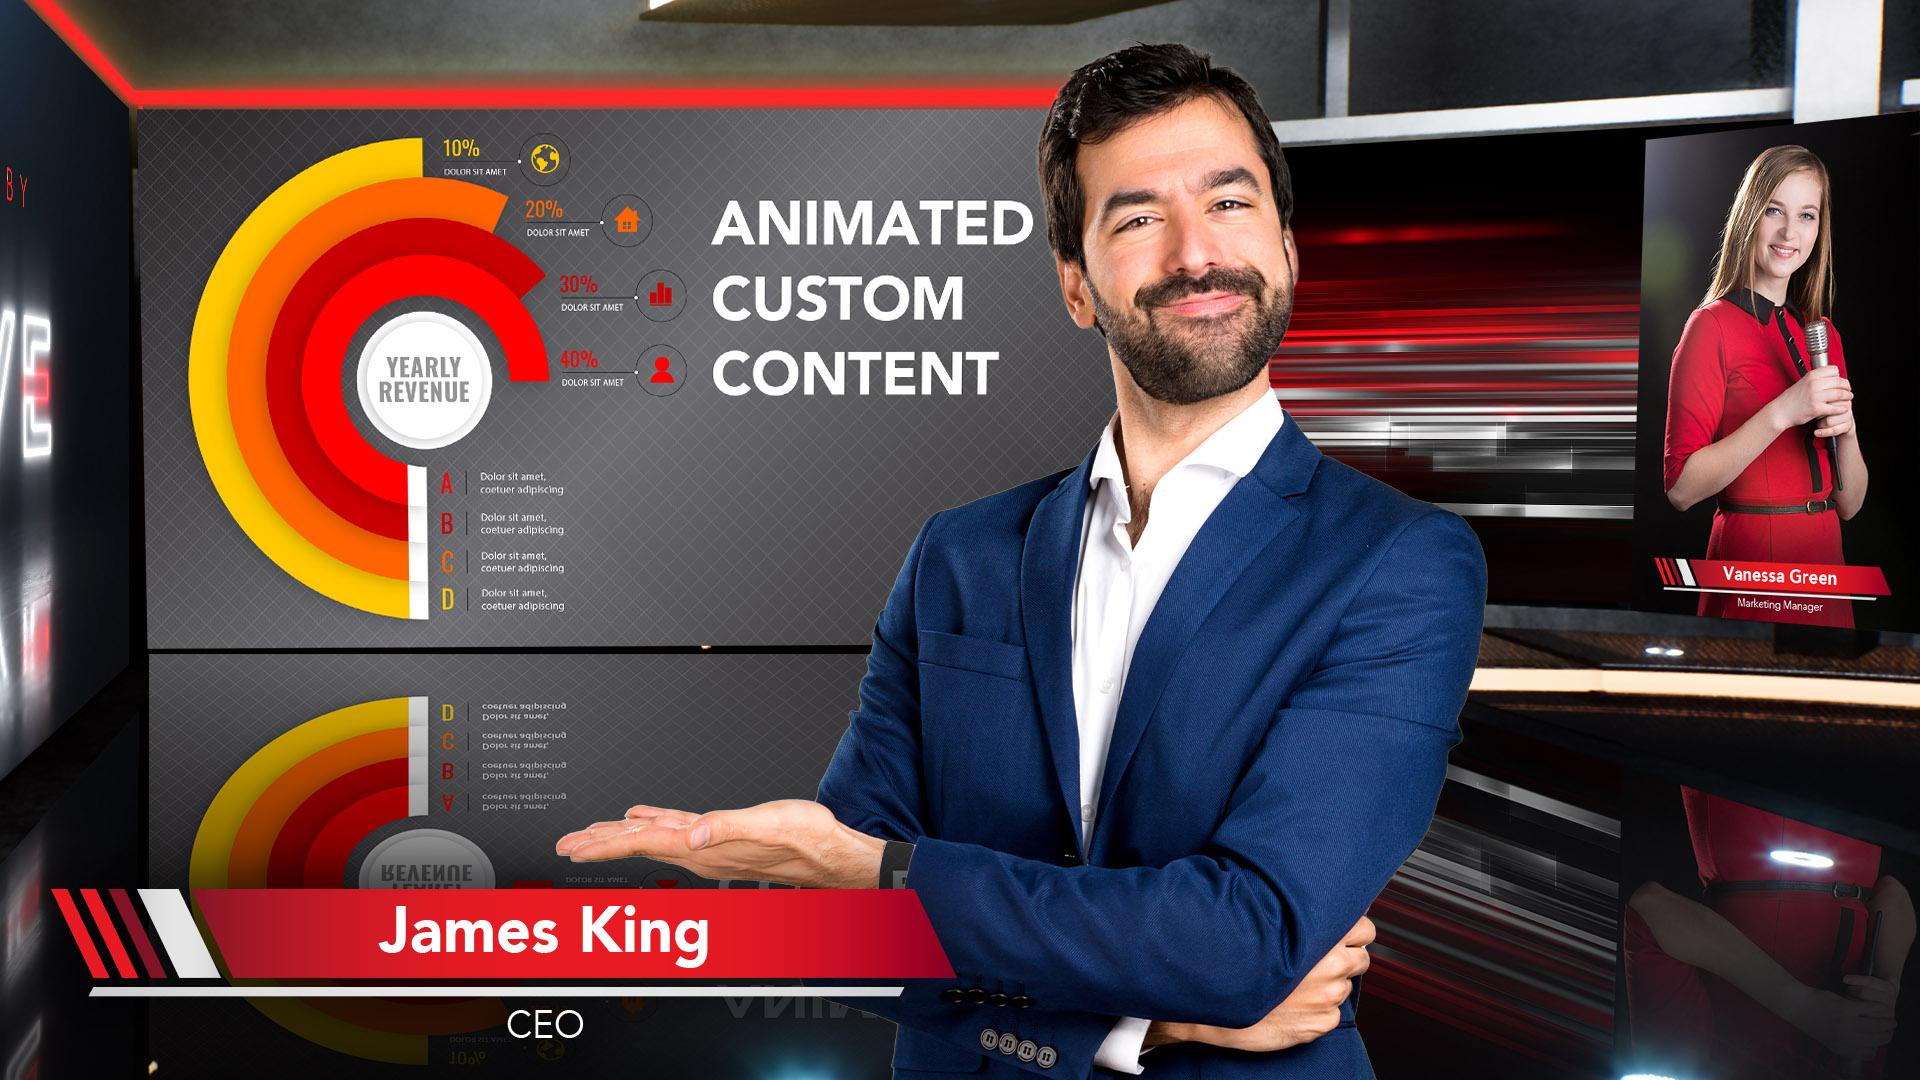 Alive TV - Animated Custom Content